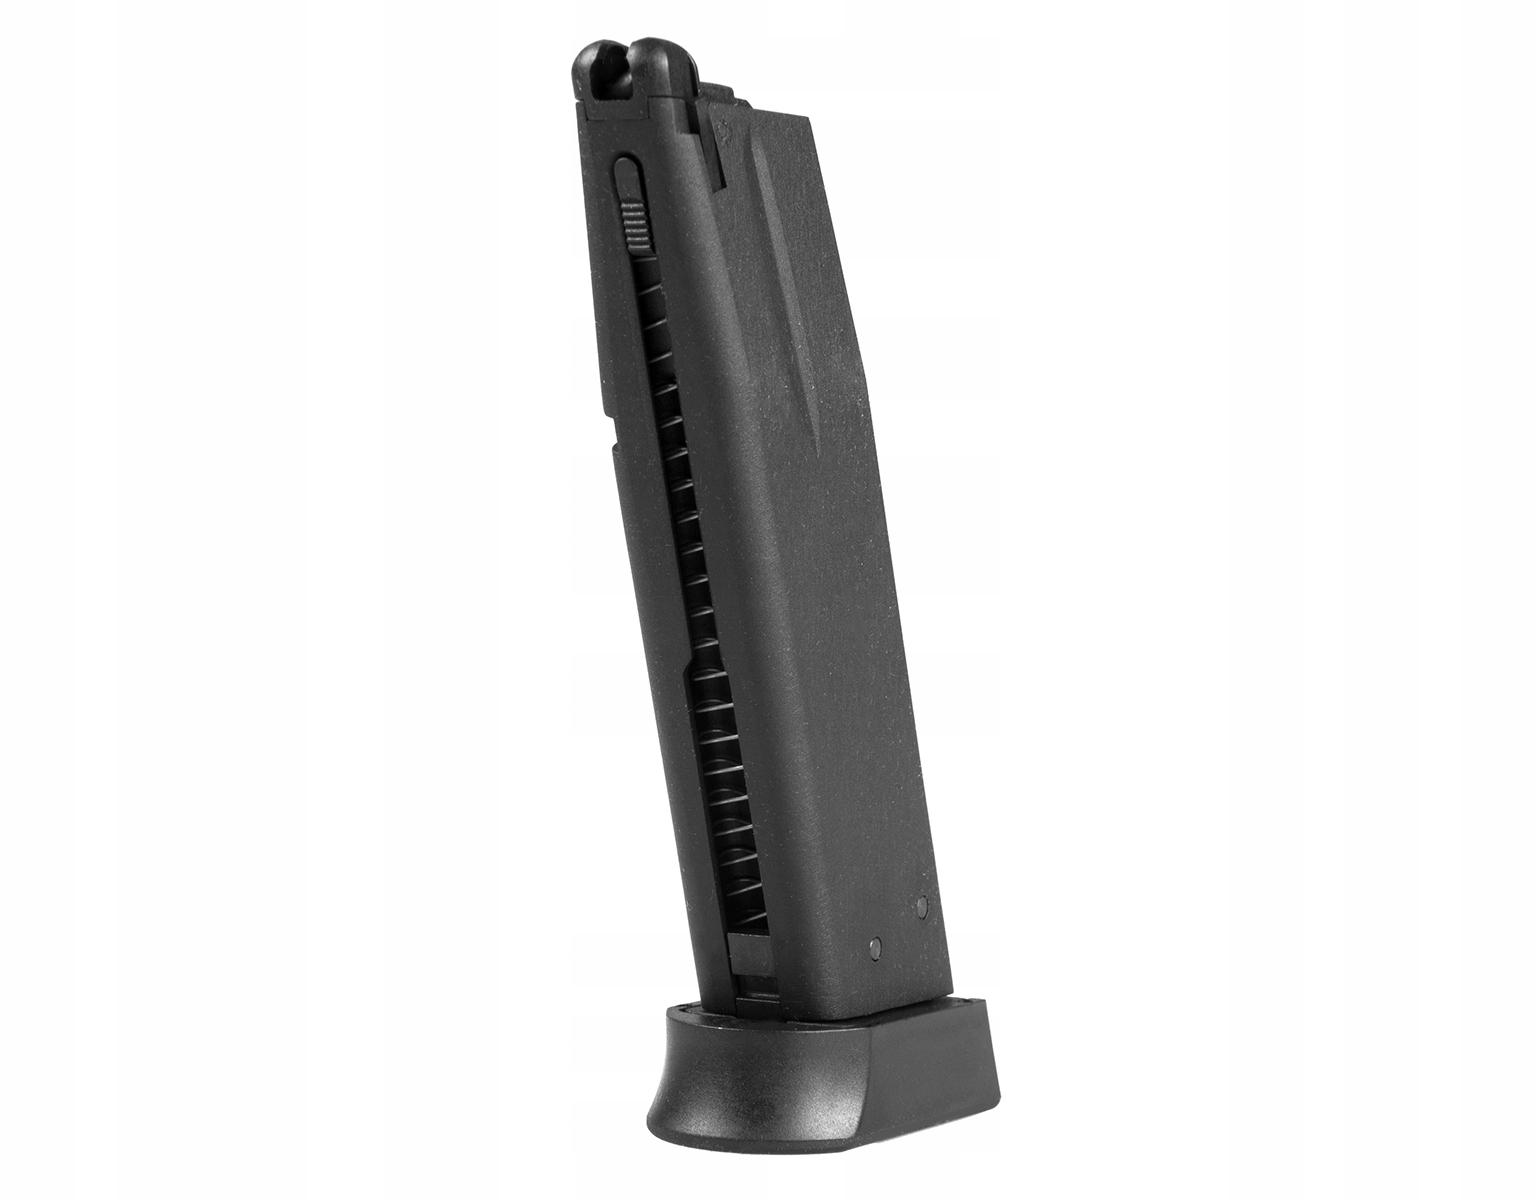 Shop ASG GBB pištole CZ SP-01 Tieň